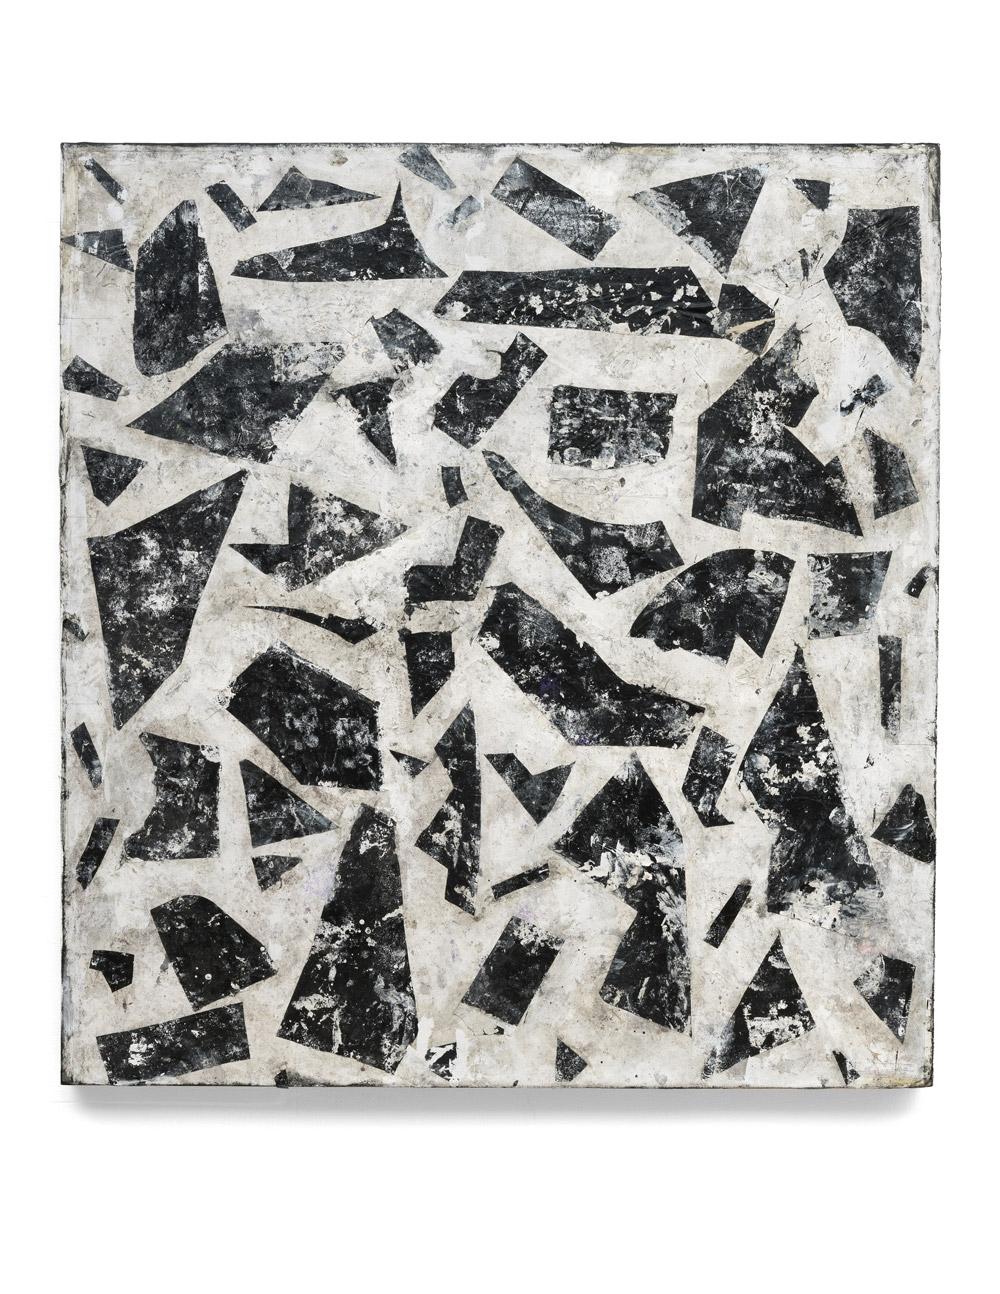 Greg Haberny Paper Or Plastic 2016 127 × 120 × 10 cm